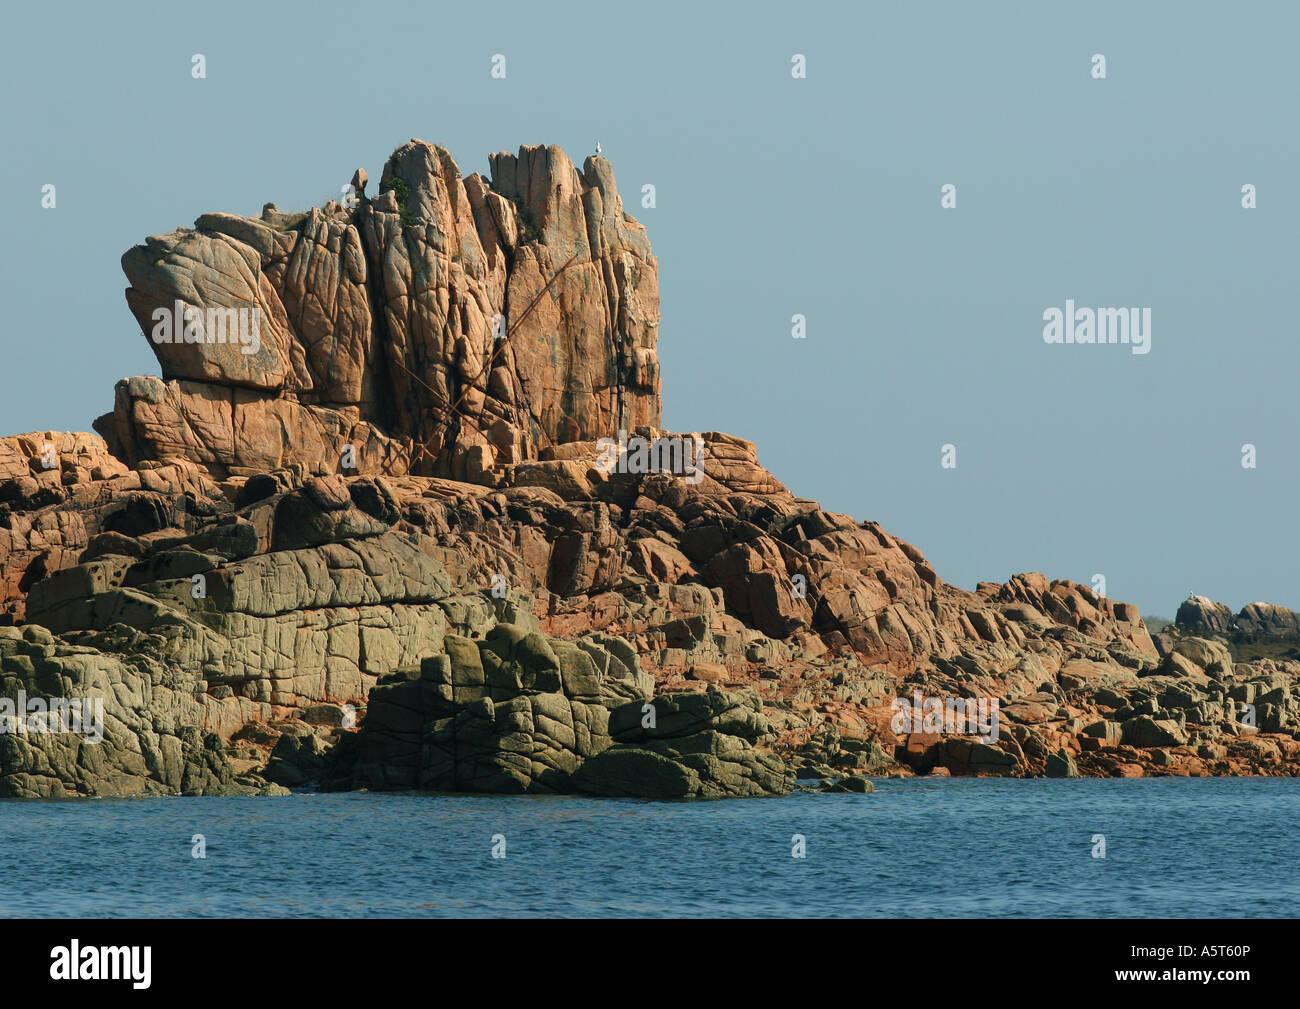 Ile de Brehat, Brittany, France, coastal rock formations - Stock Image